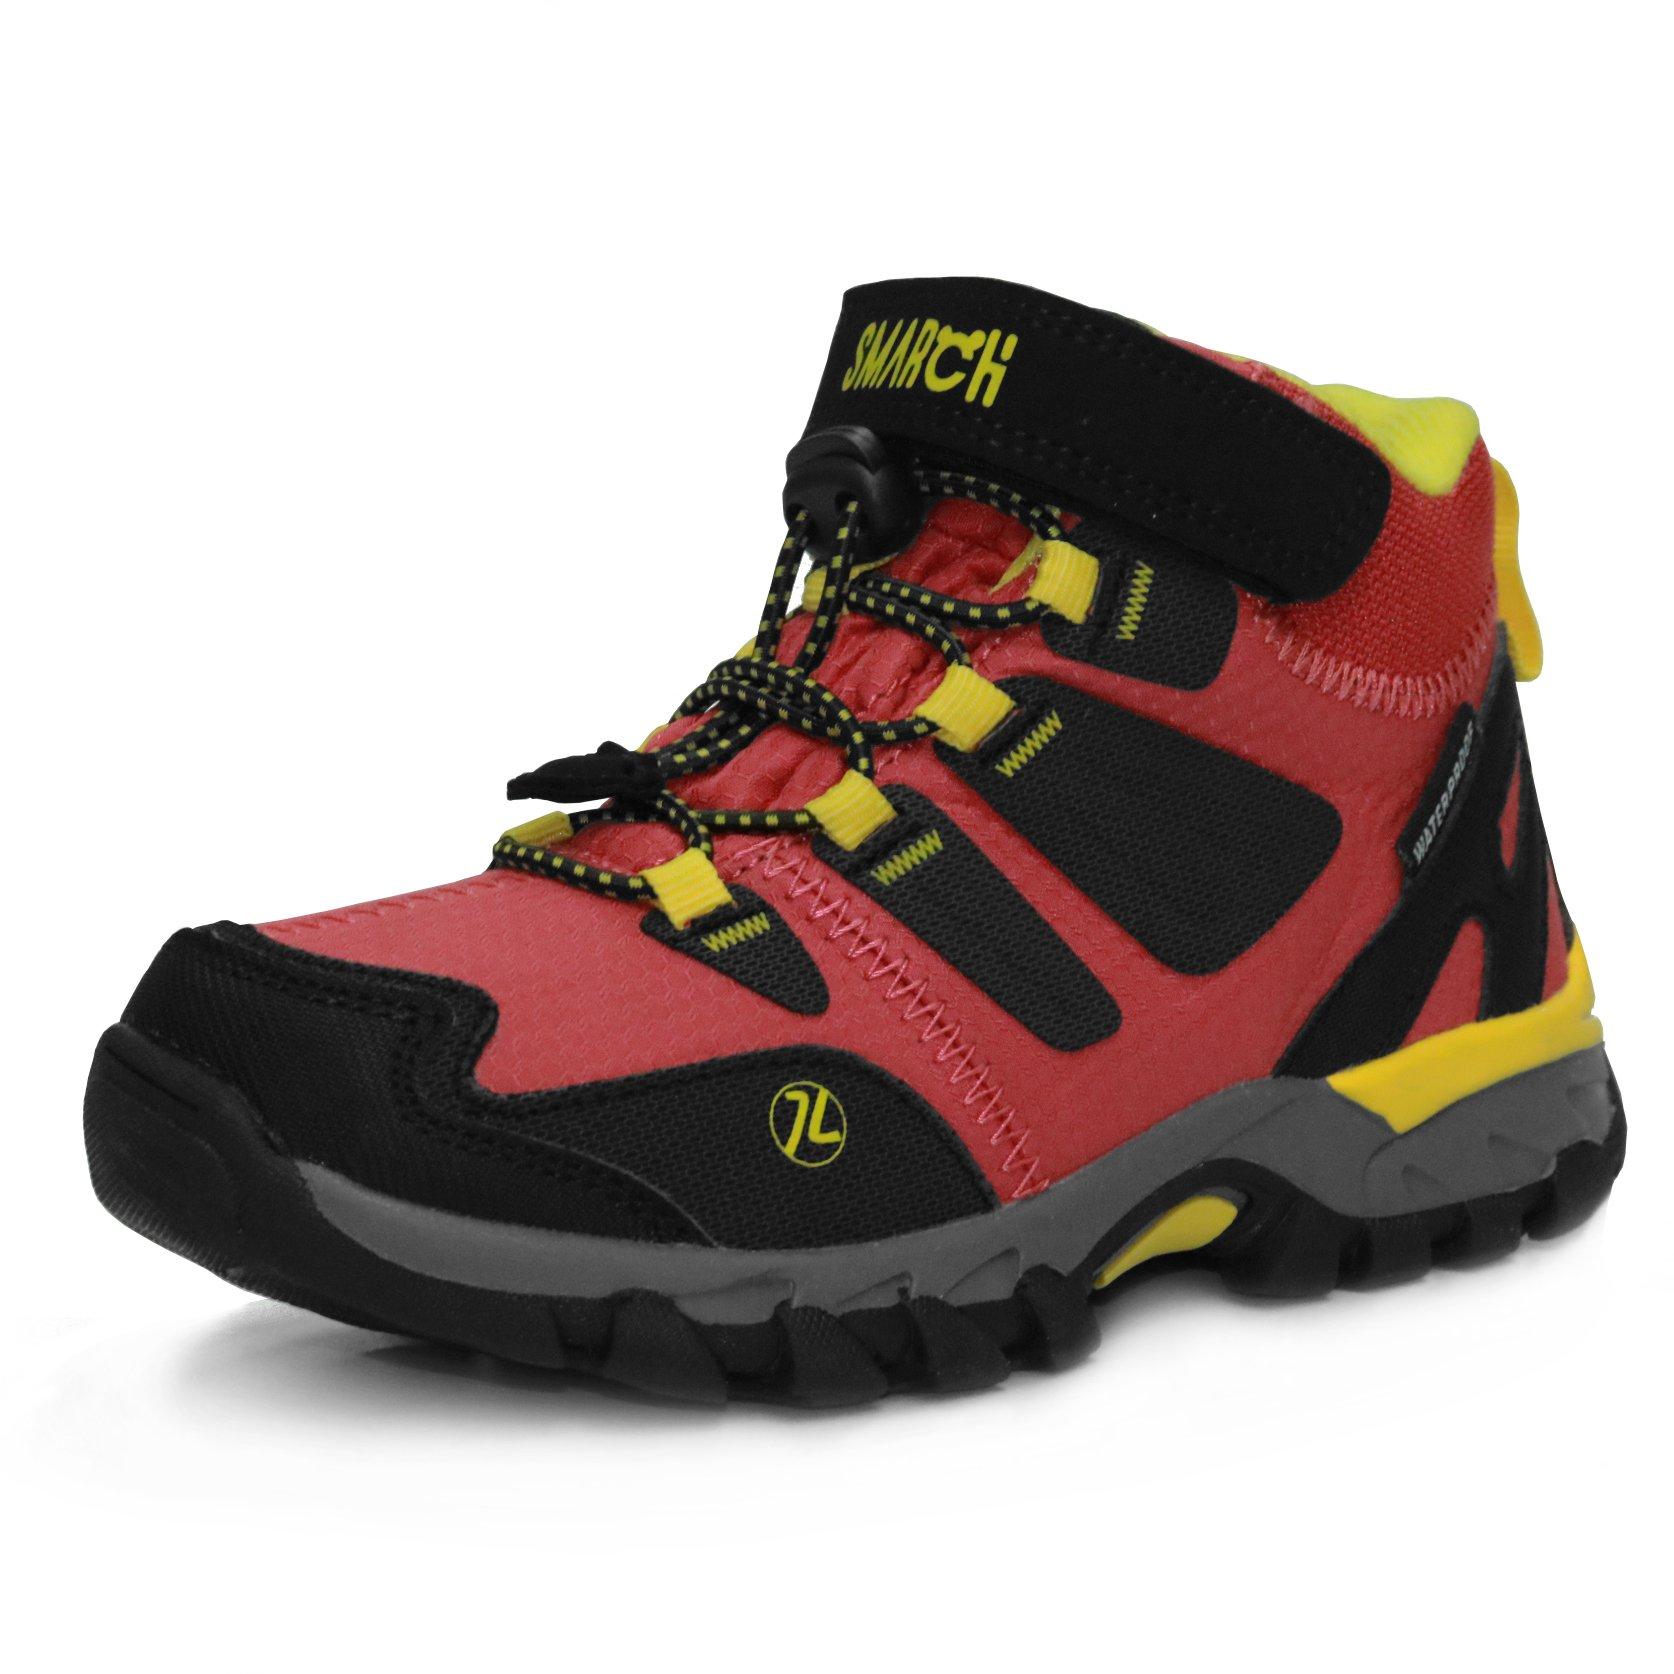 GRITION Mid Kids Outdoor Hiking Trekking Boots Boys Girls Hook and Loop  Winter Walking Boots School Shoes Waterproof Anti Slip Climbing Boots  Unisex Kids Size EU 28-35- Buy Online in Dominica at